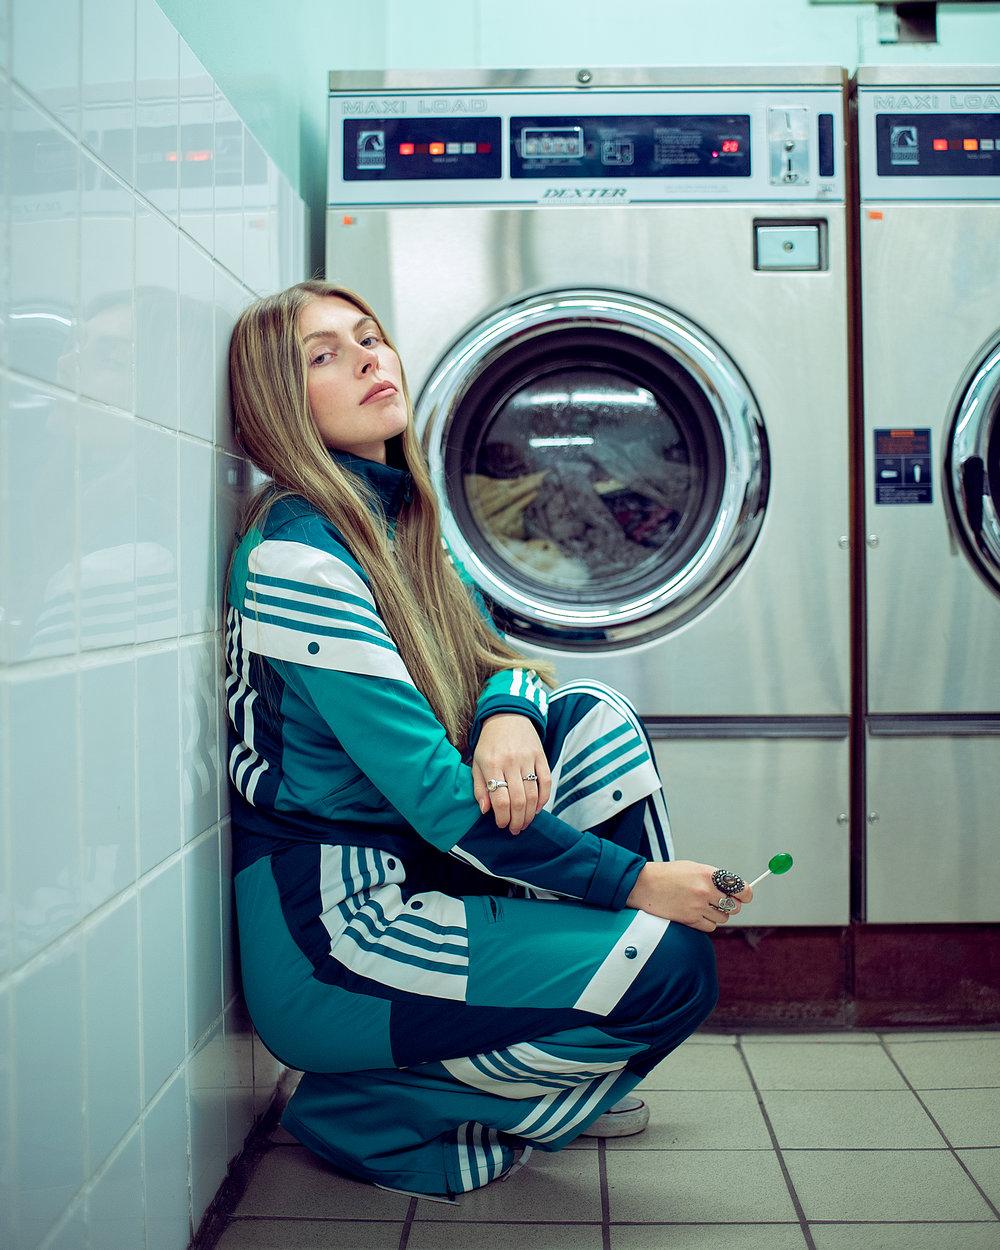 Laundry-13.jpg